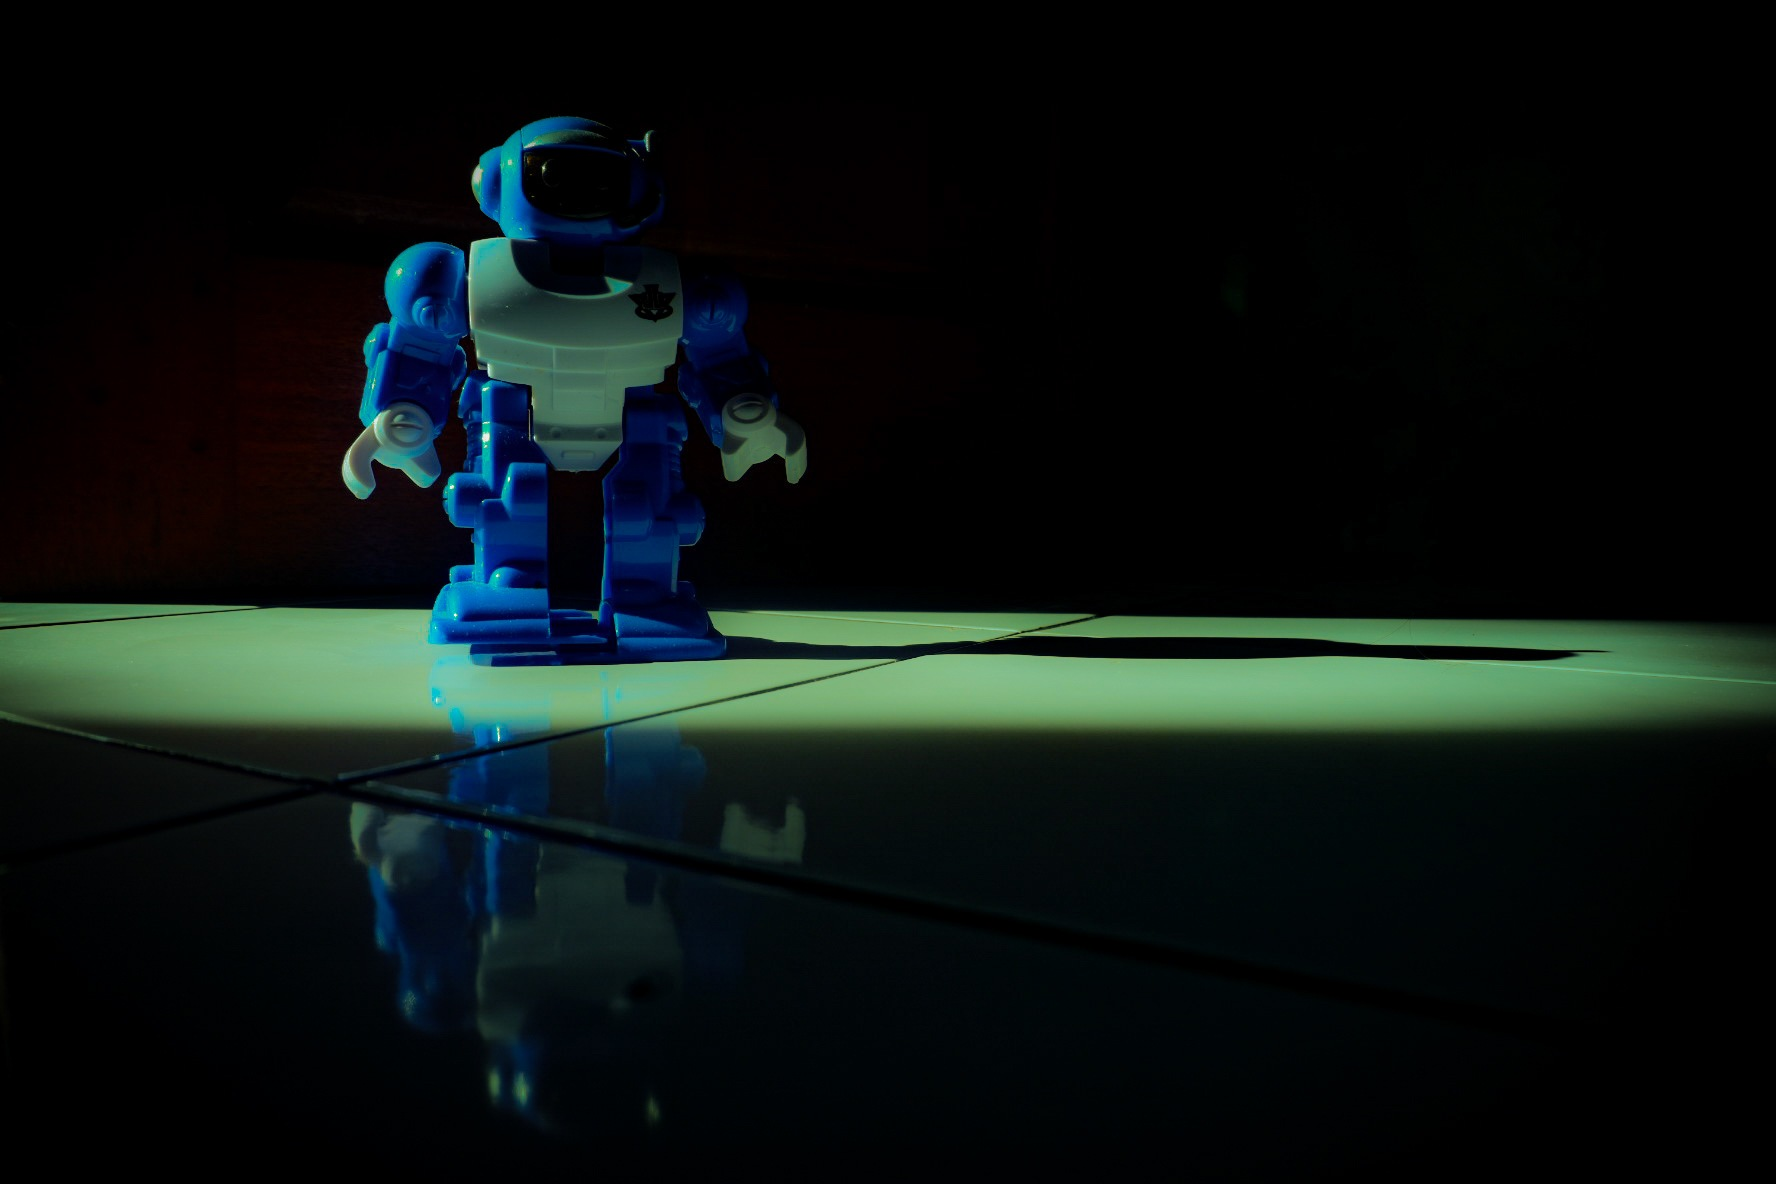 toy with shadow..  by Danang surya rahmandhani